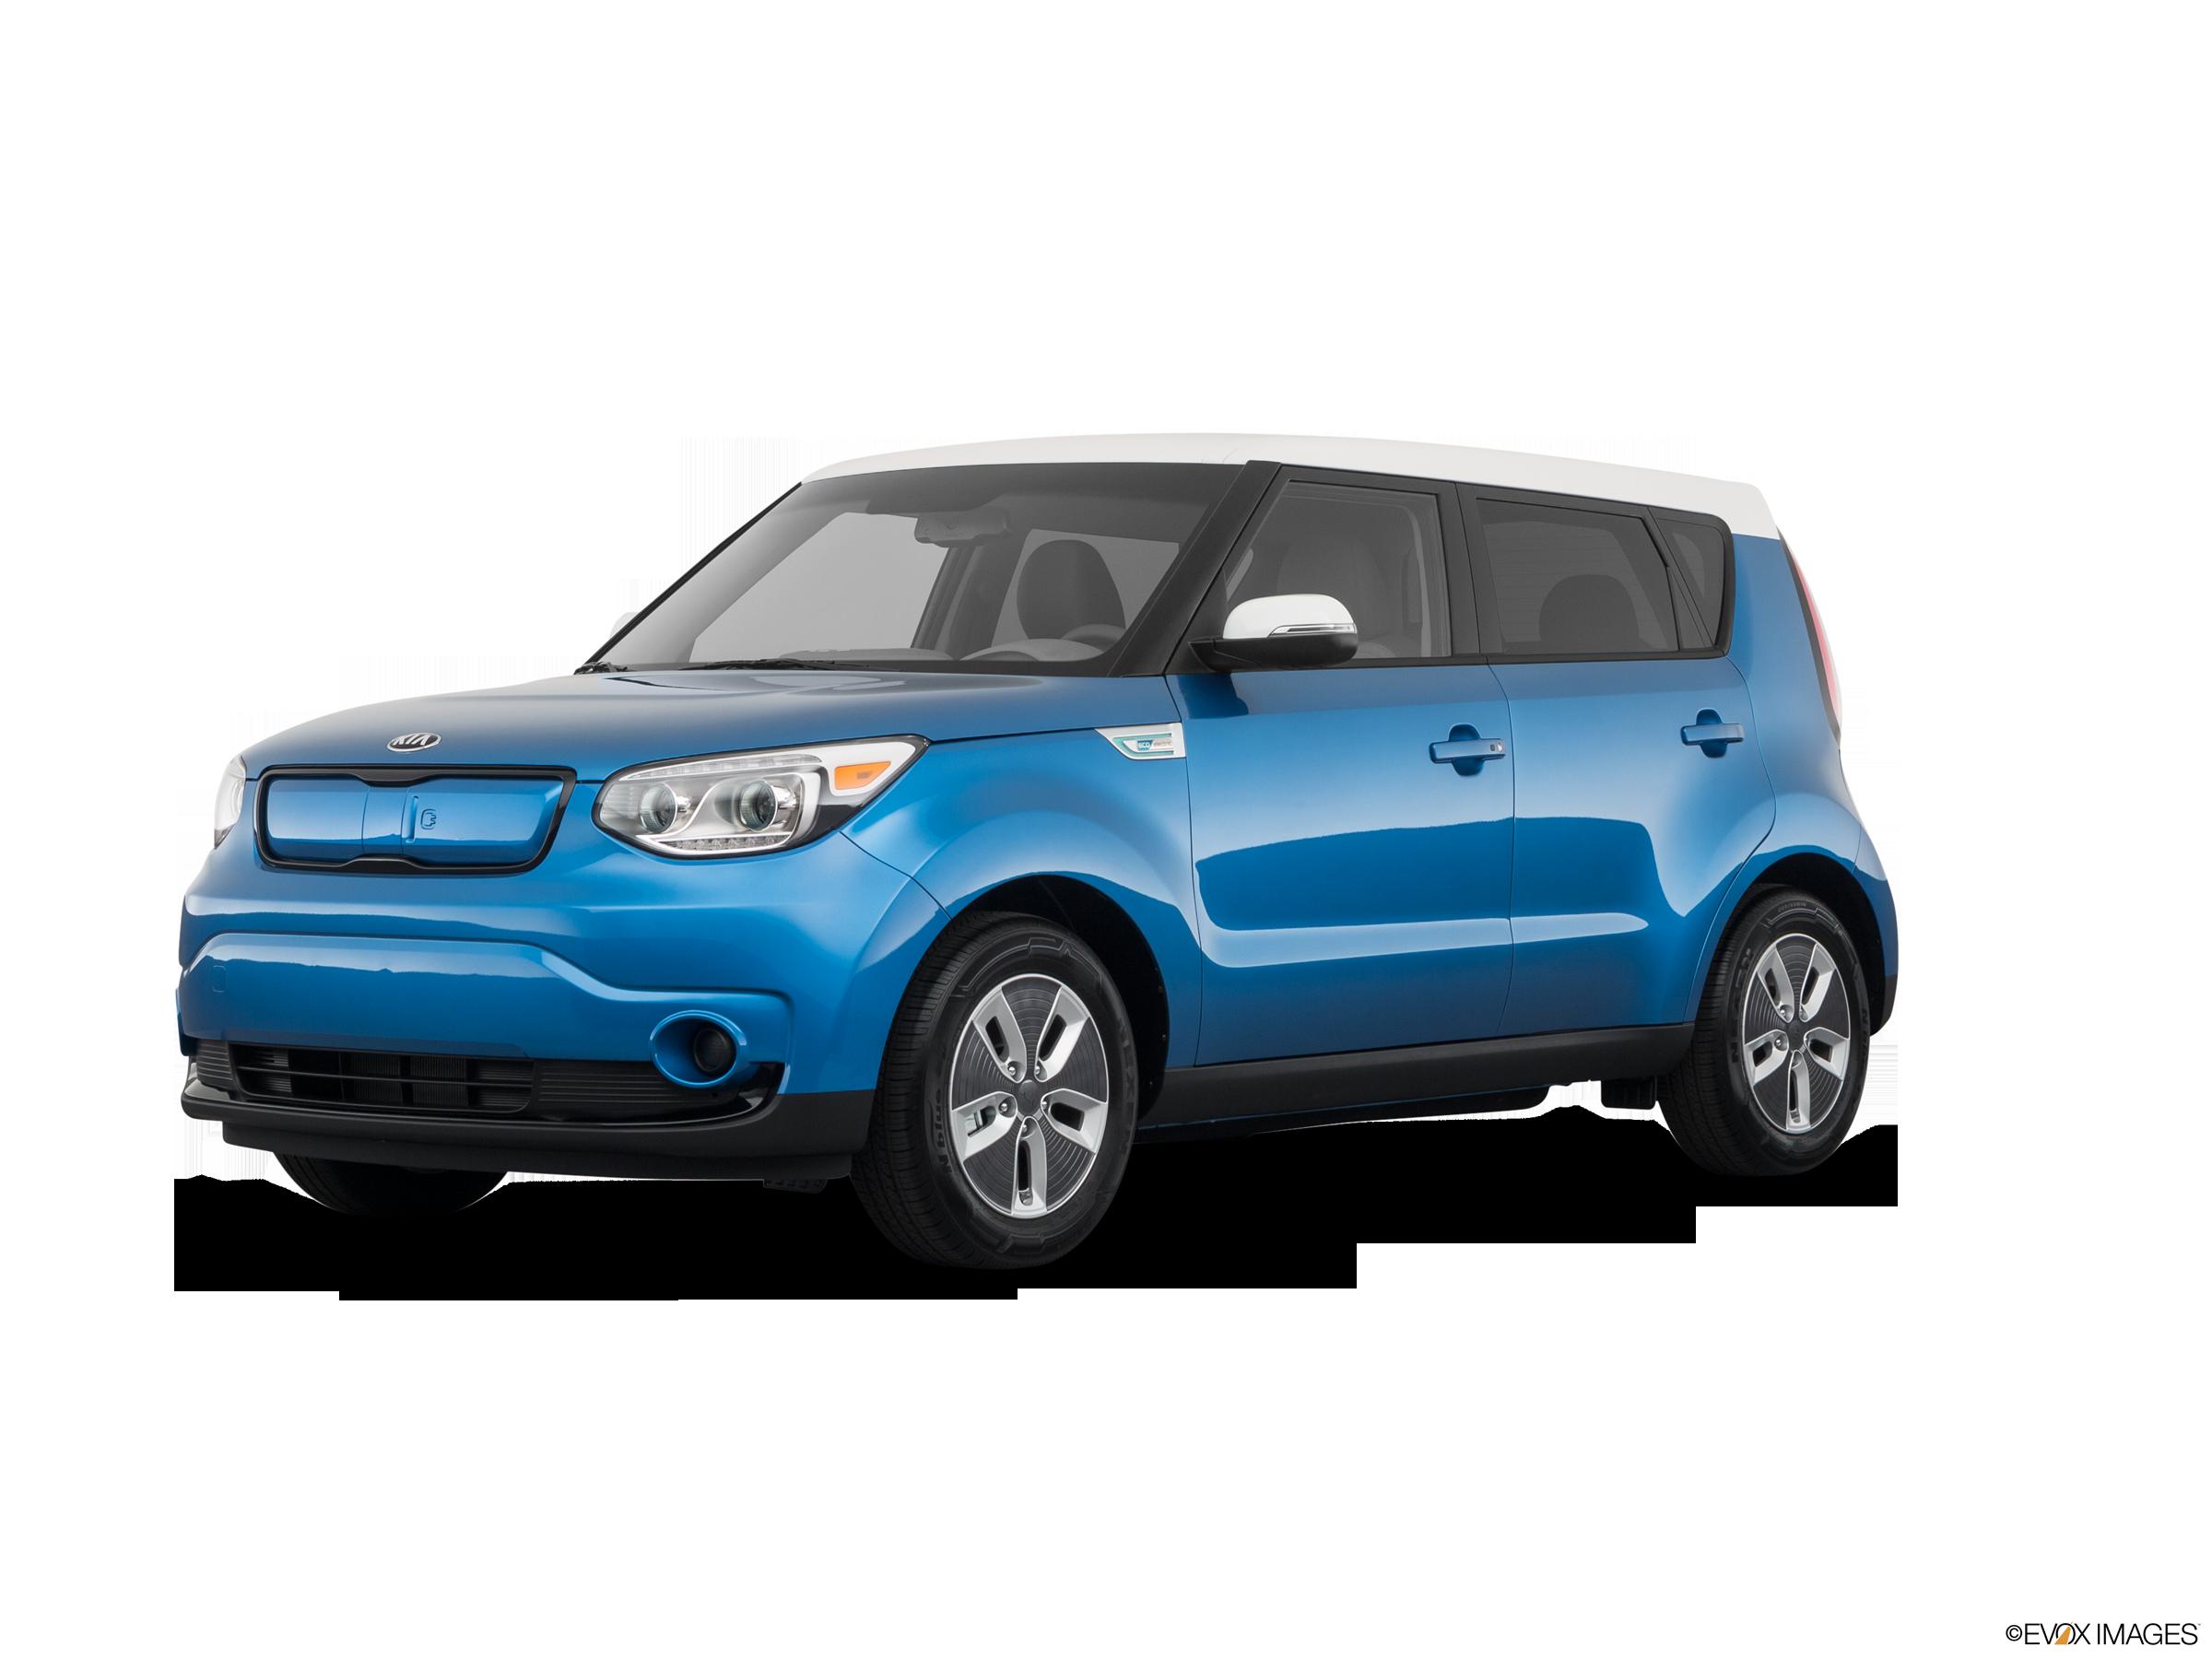 2012 Hyundai Elantra Pricing Ratings Expert Review Kelley Blue